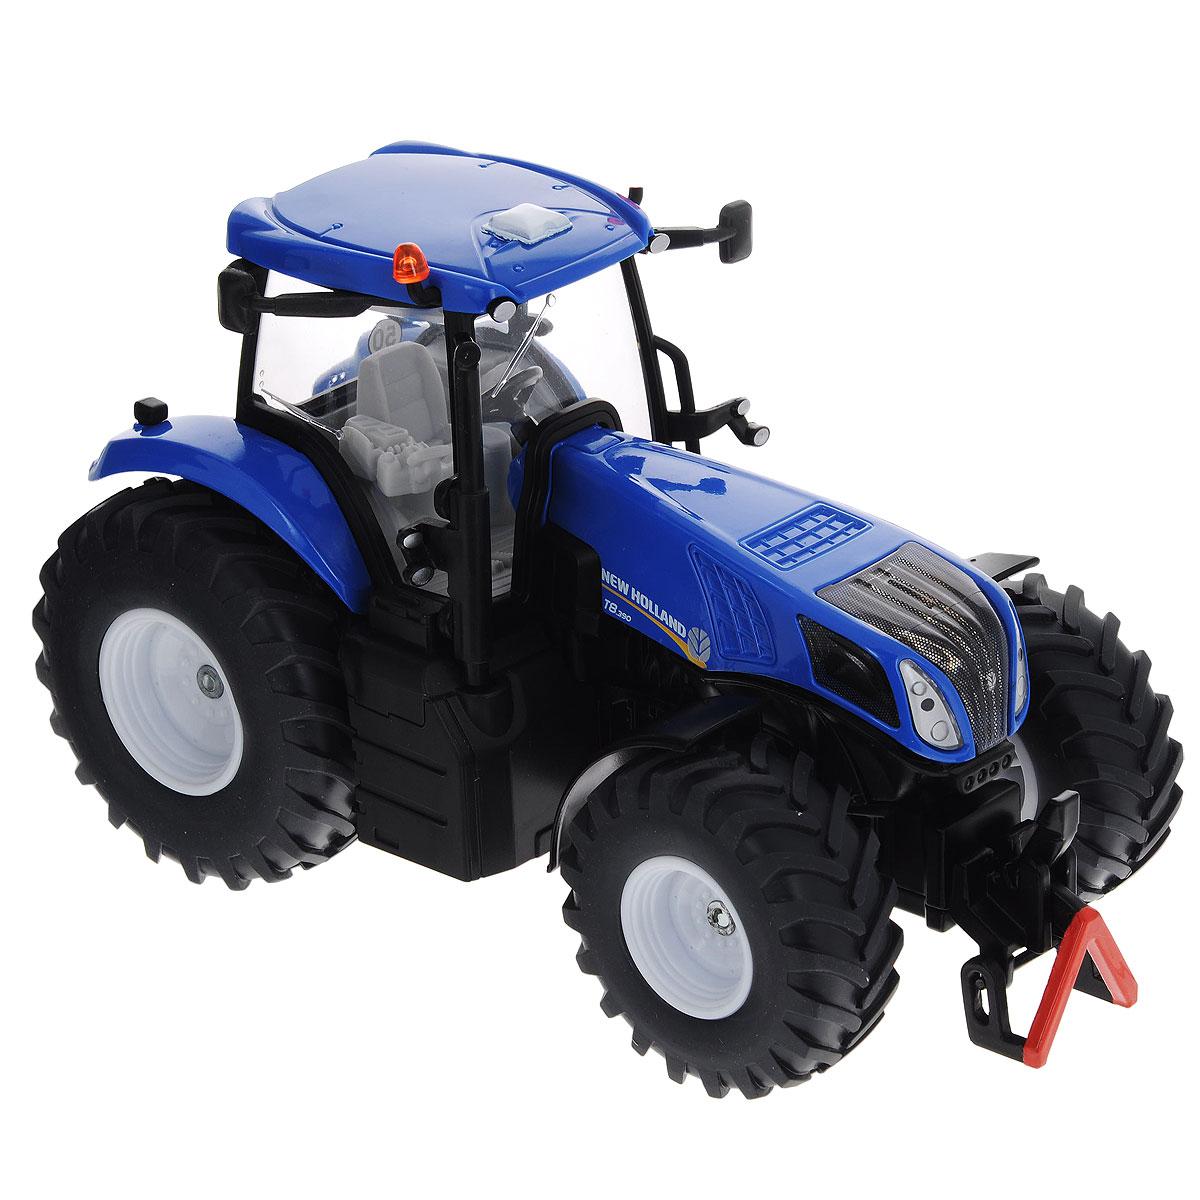 Siku Трактор New Holland T8.390 siku трактор new holland t7070 с опрыскивателем kverneland